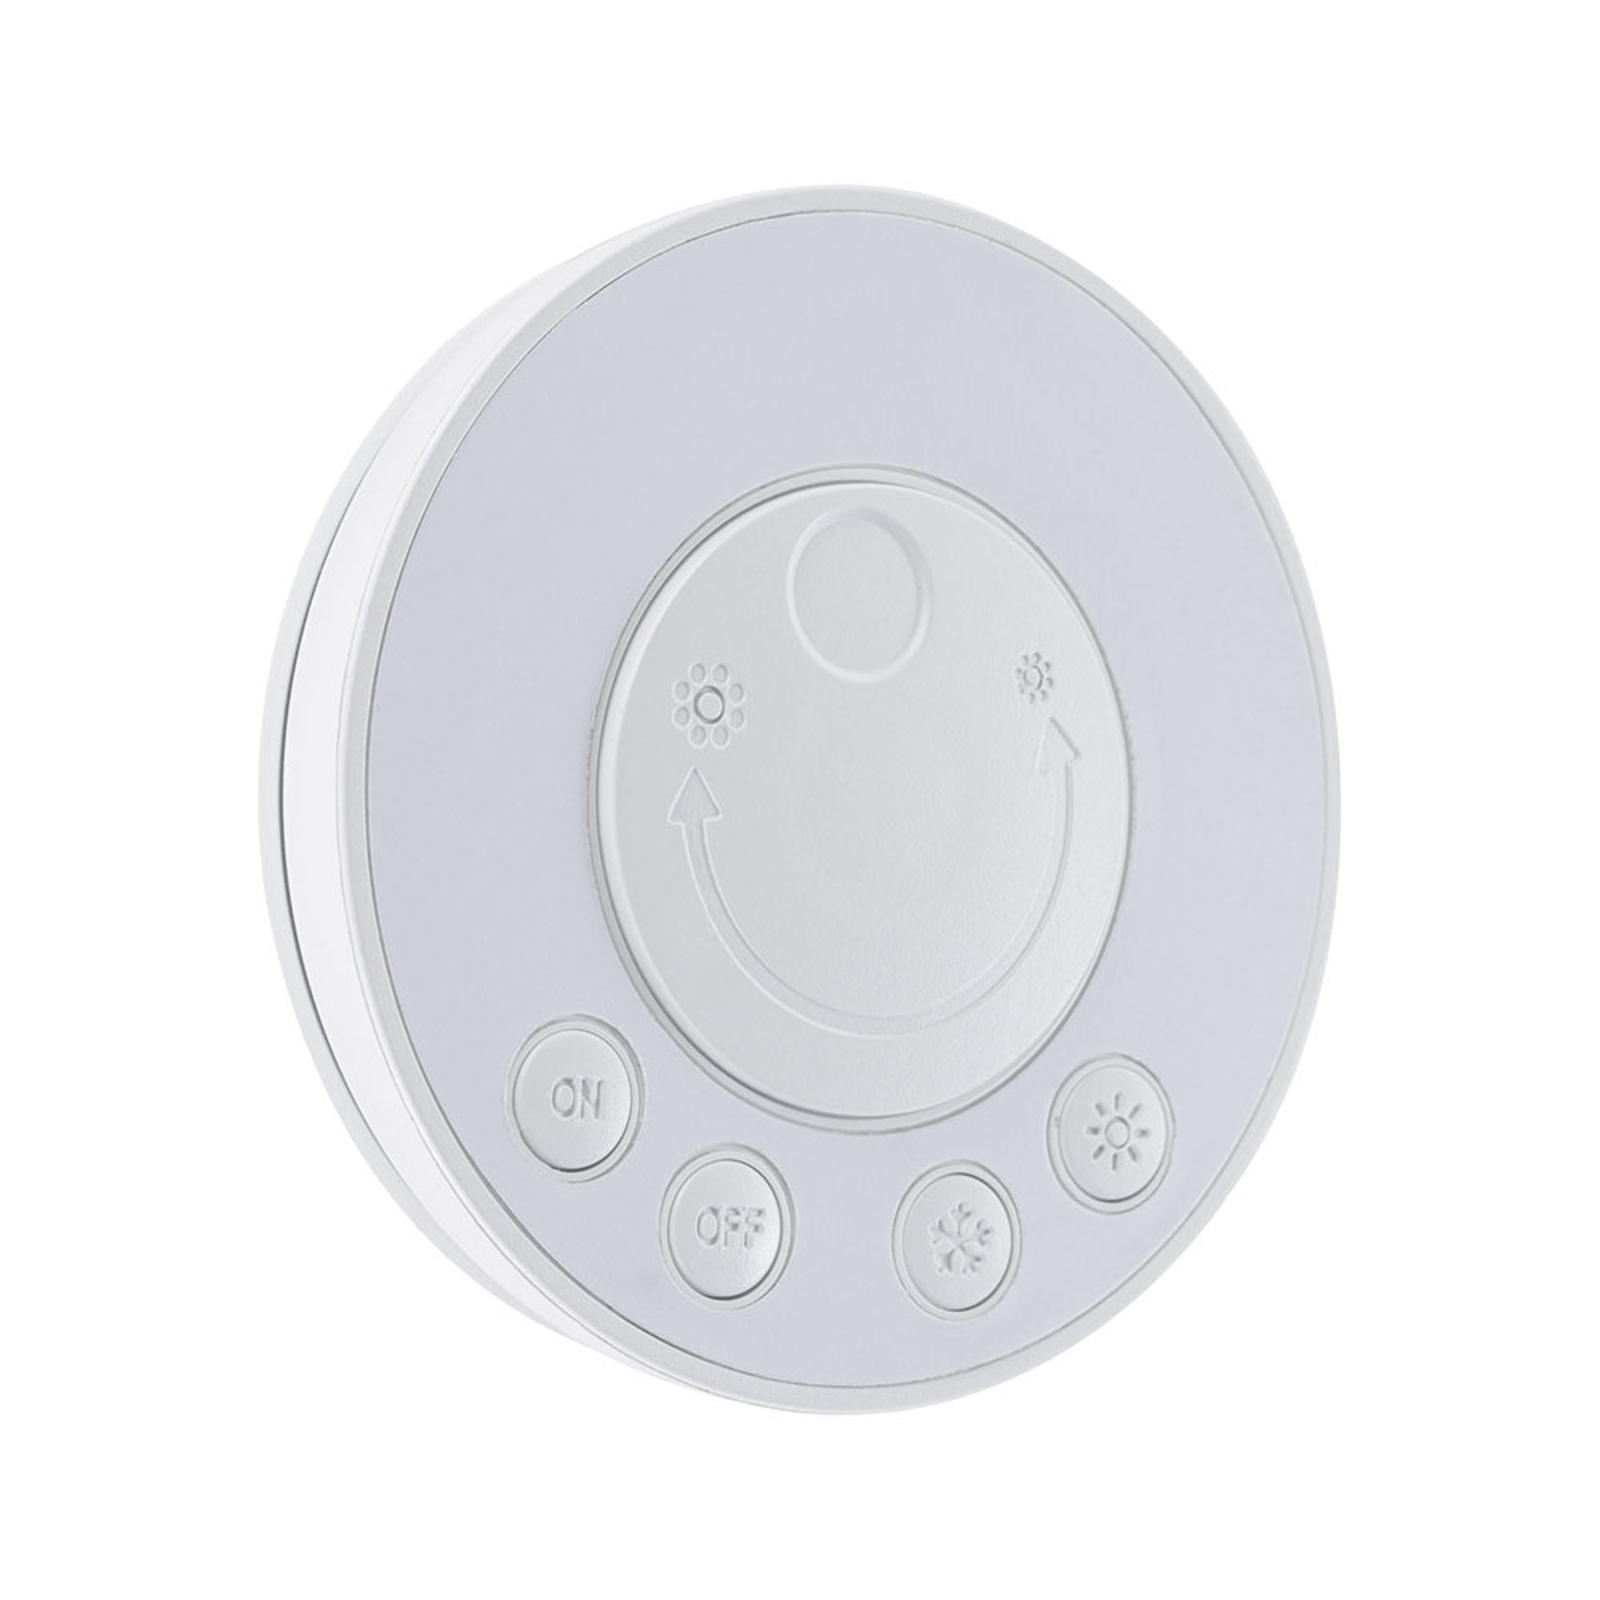 Paulmann Clever Connect Switch Bowl kontrollmodul